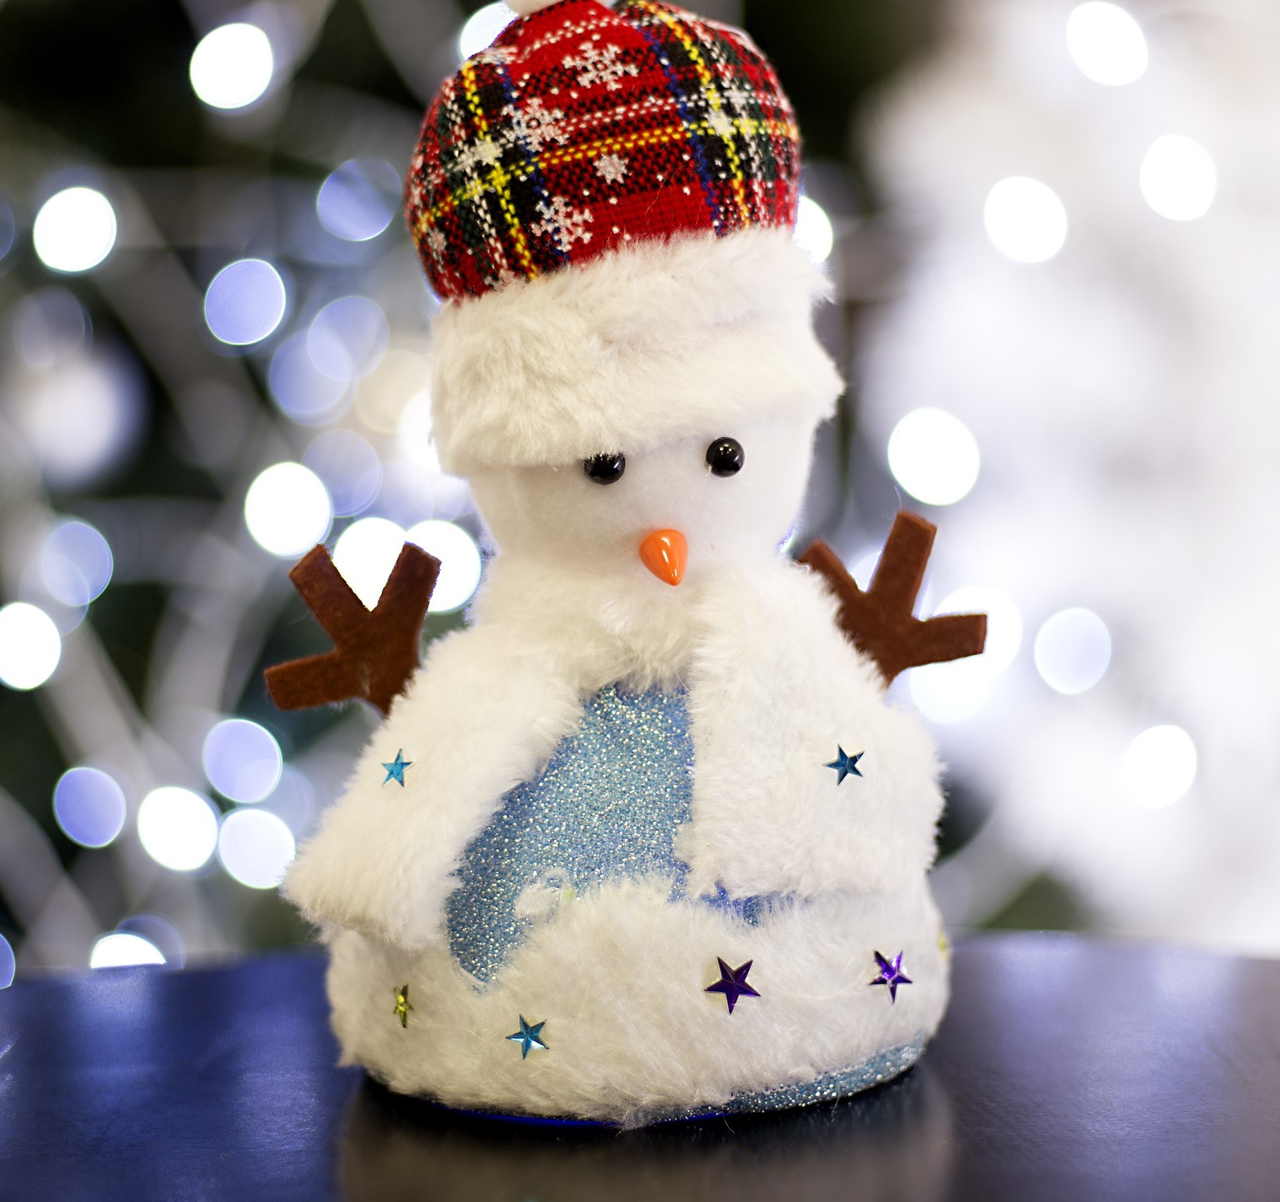 "Игрушка световая ""Праздничный снеговик"" (батарейки не комплекте) 15х20 см, 1 LED RGB, СИНИЙ"